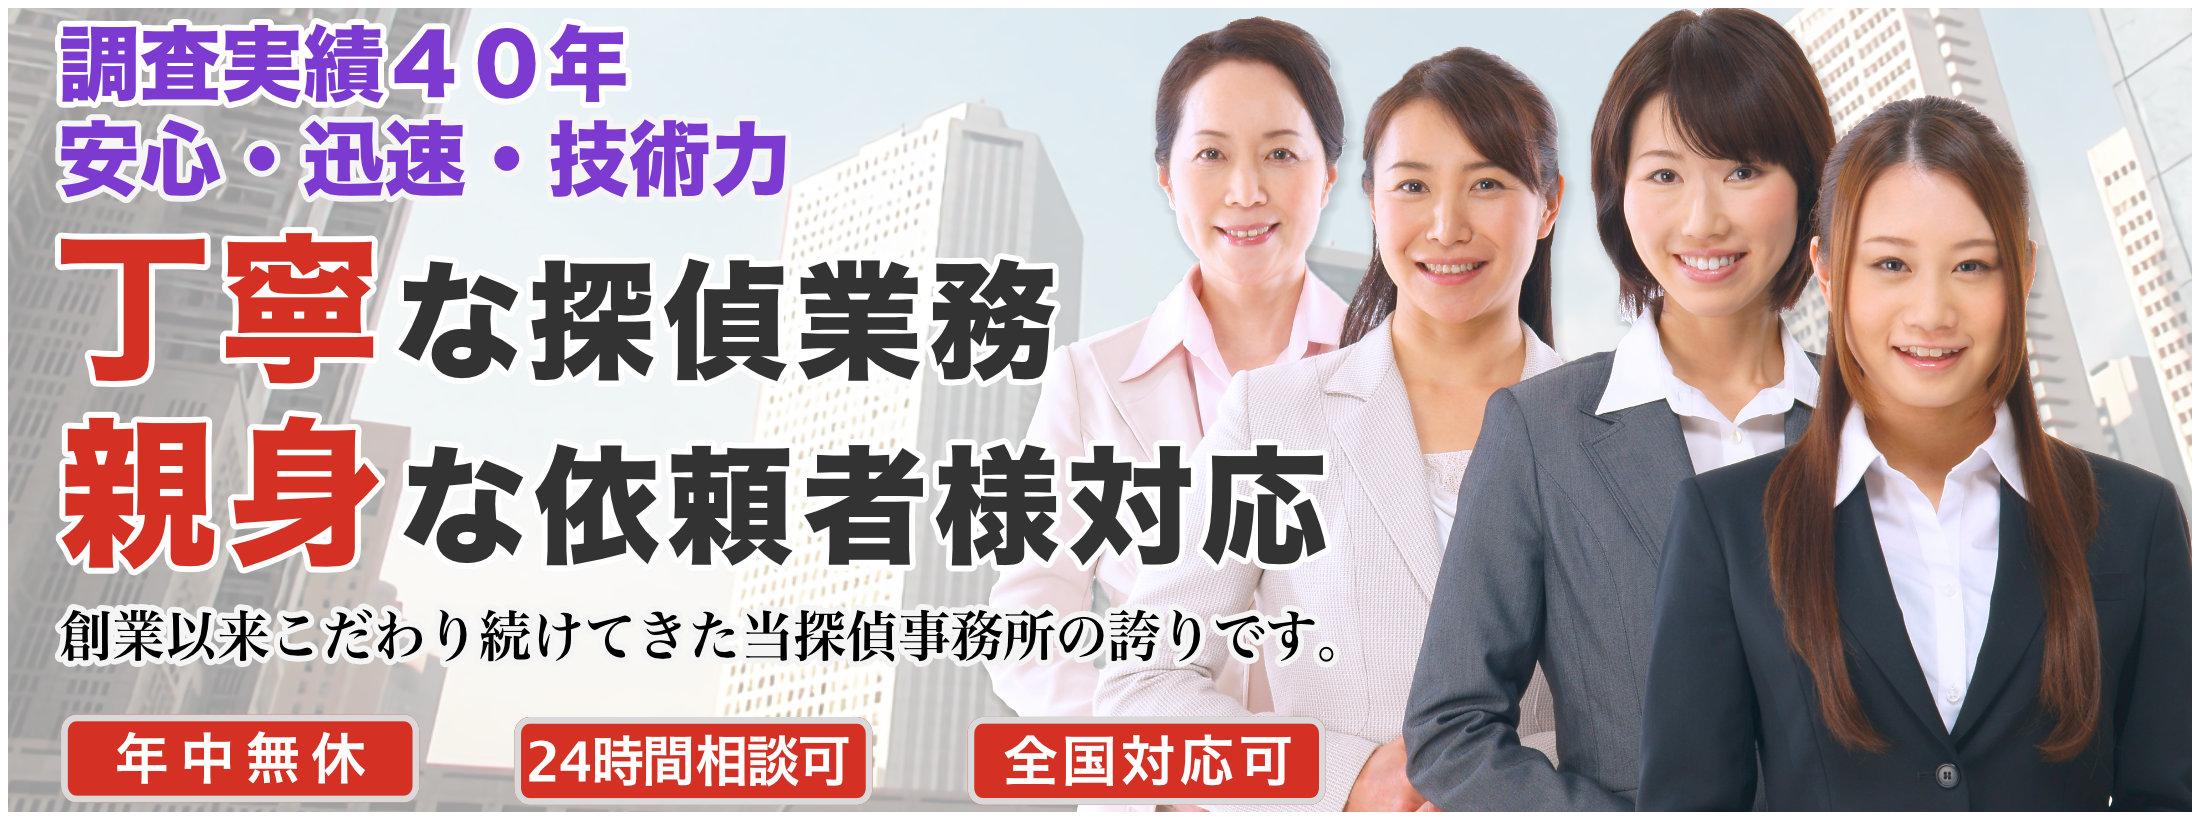 SC(エスシー)探偵事務所新宿は新宿駅より徒歩3分の調査実績40年の低料金・成功報酬制の探偵事務所です。